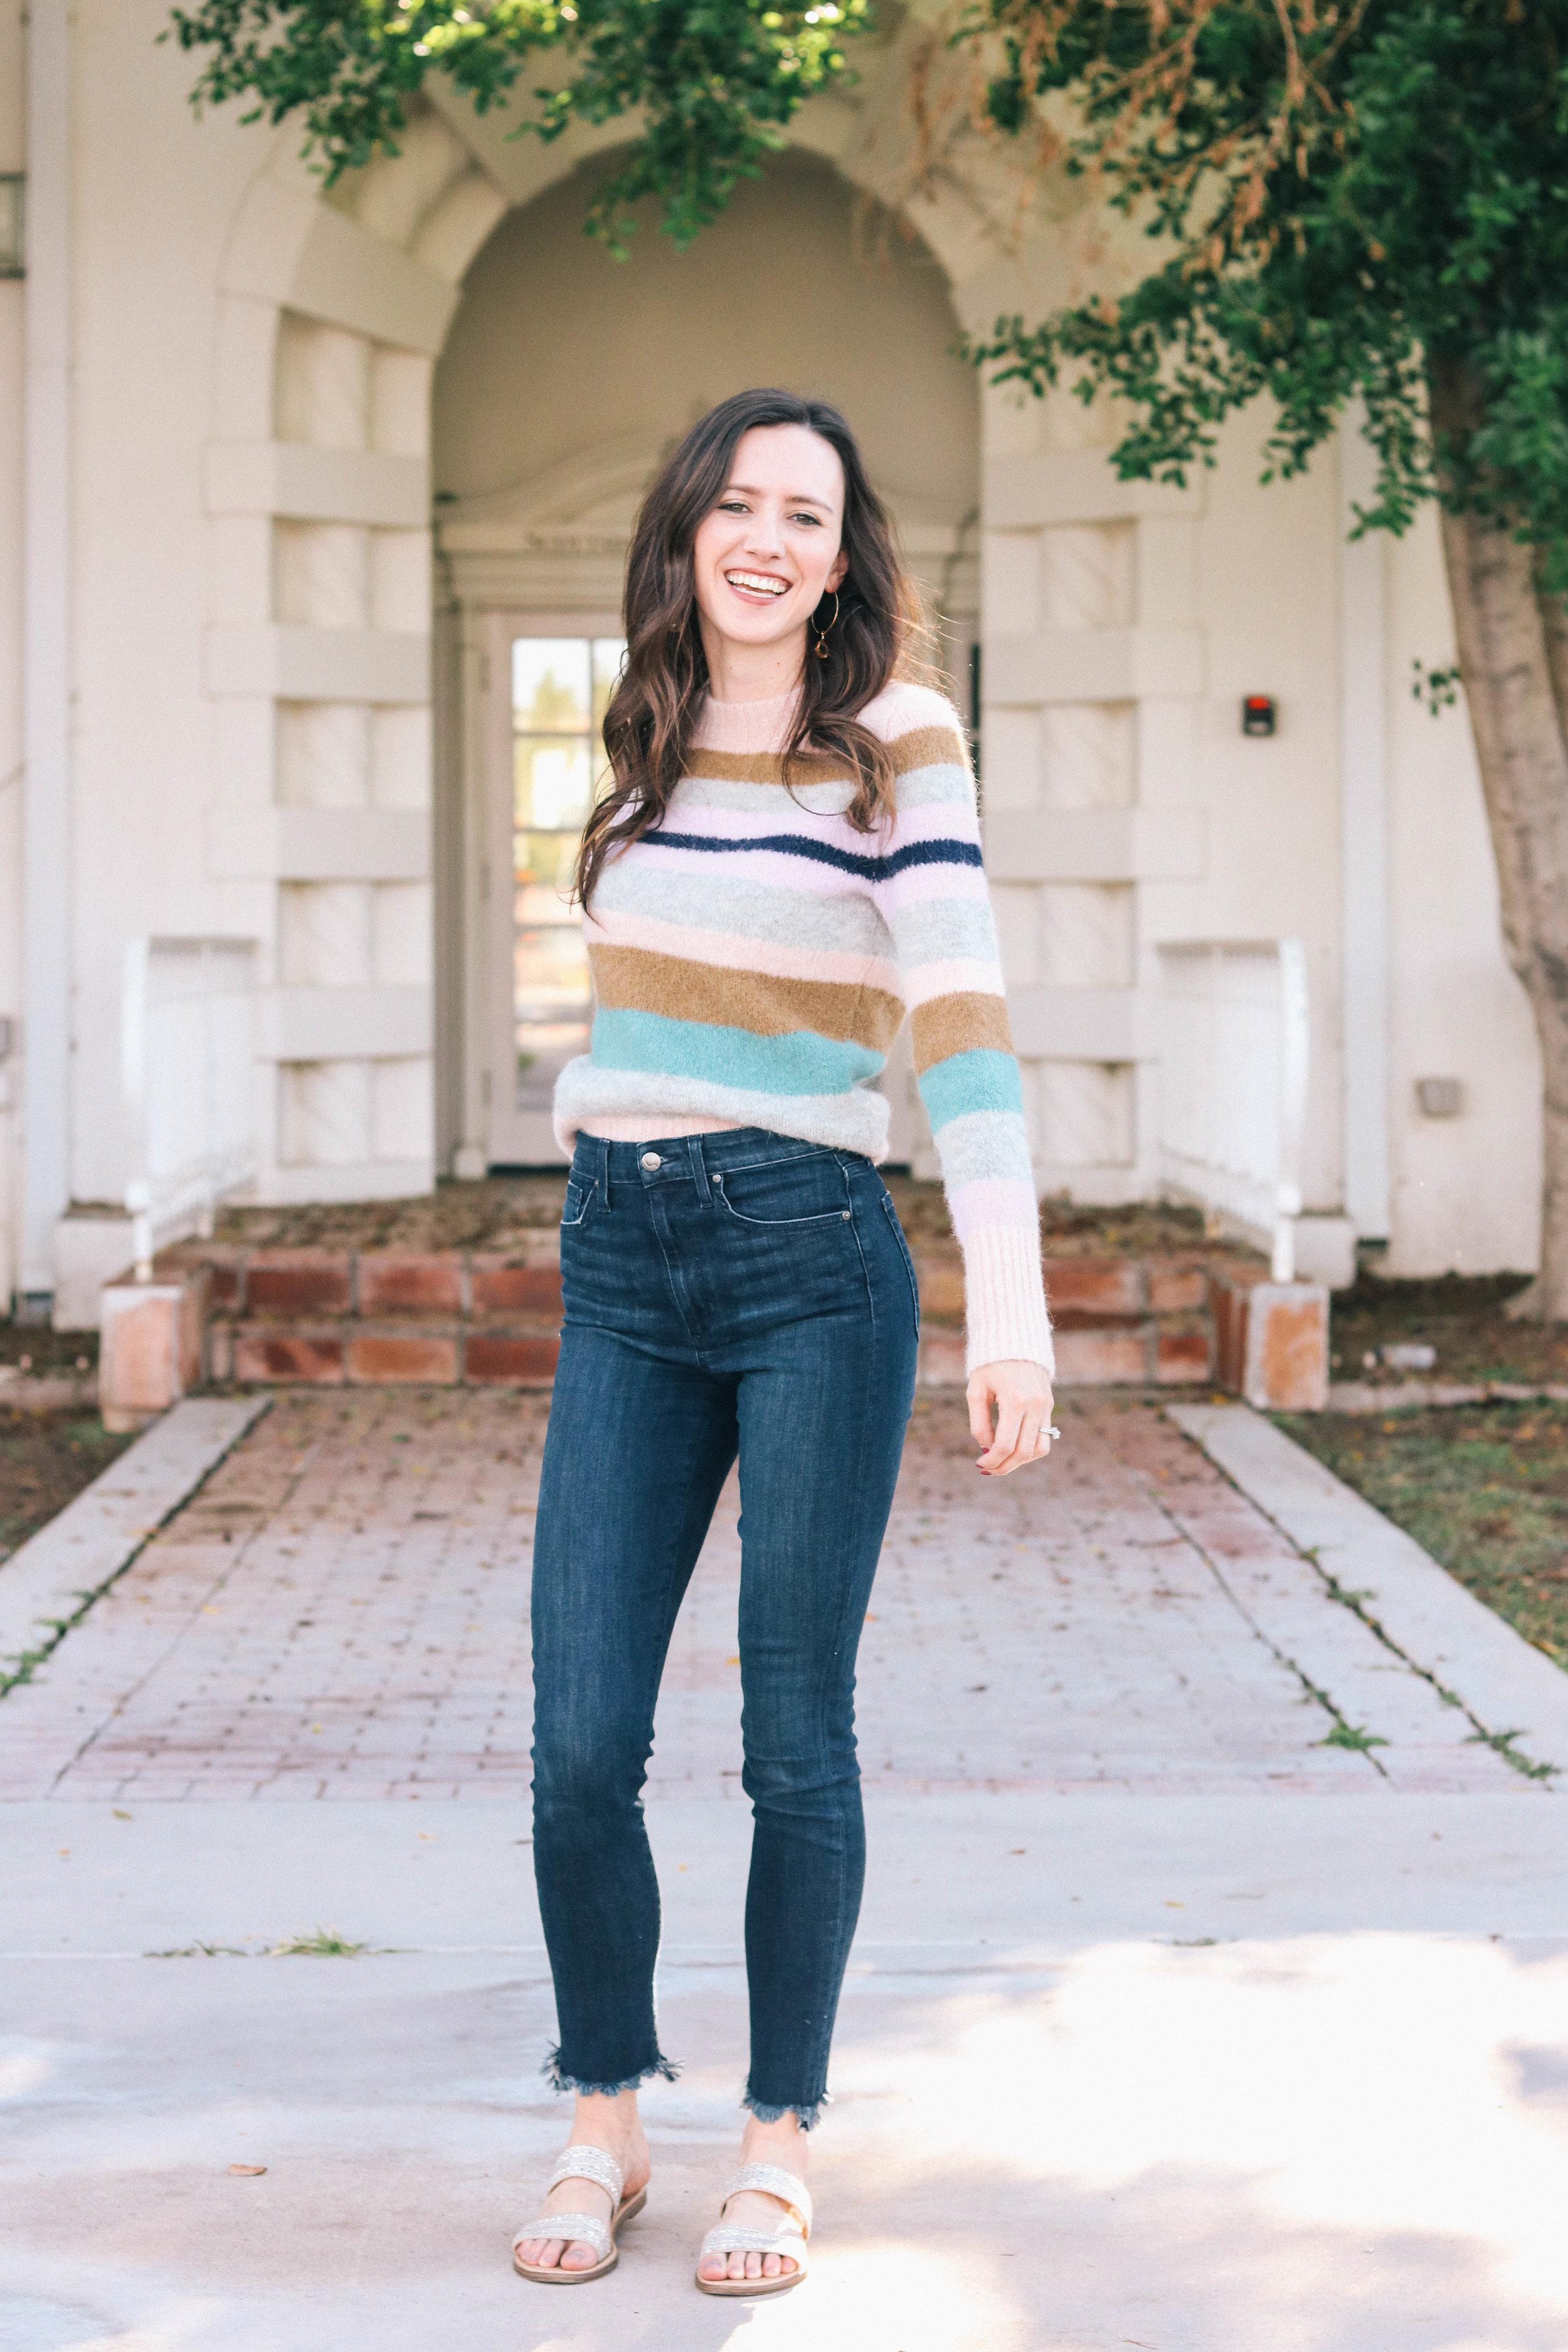 bb-striped-sweater-006 (1 of 1).jpg